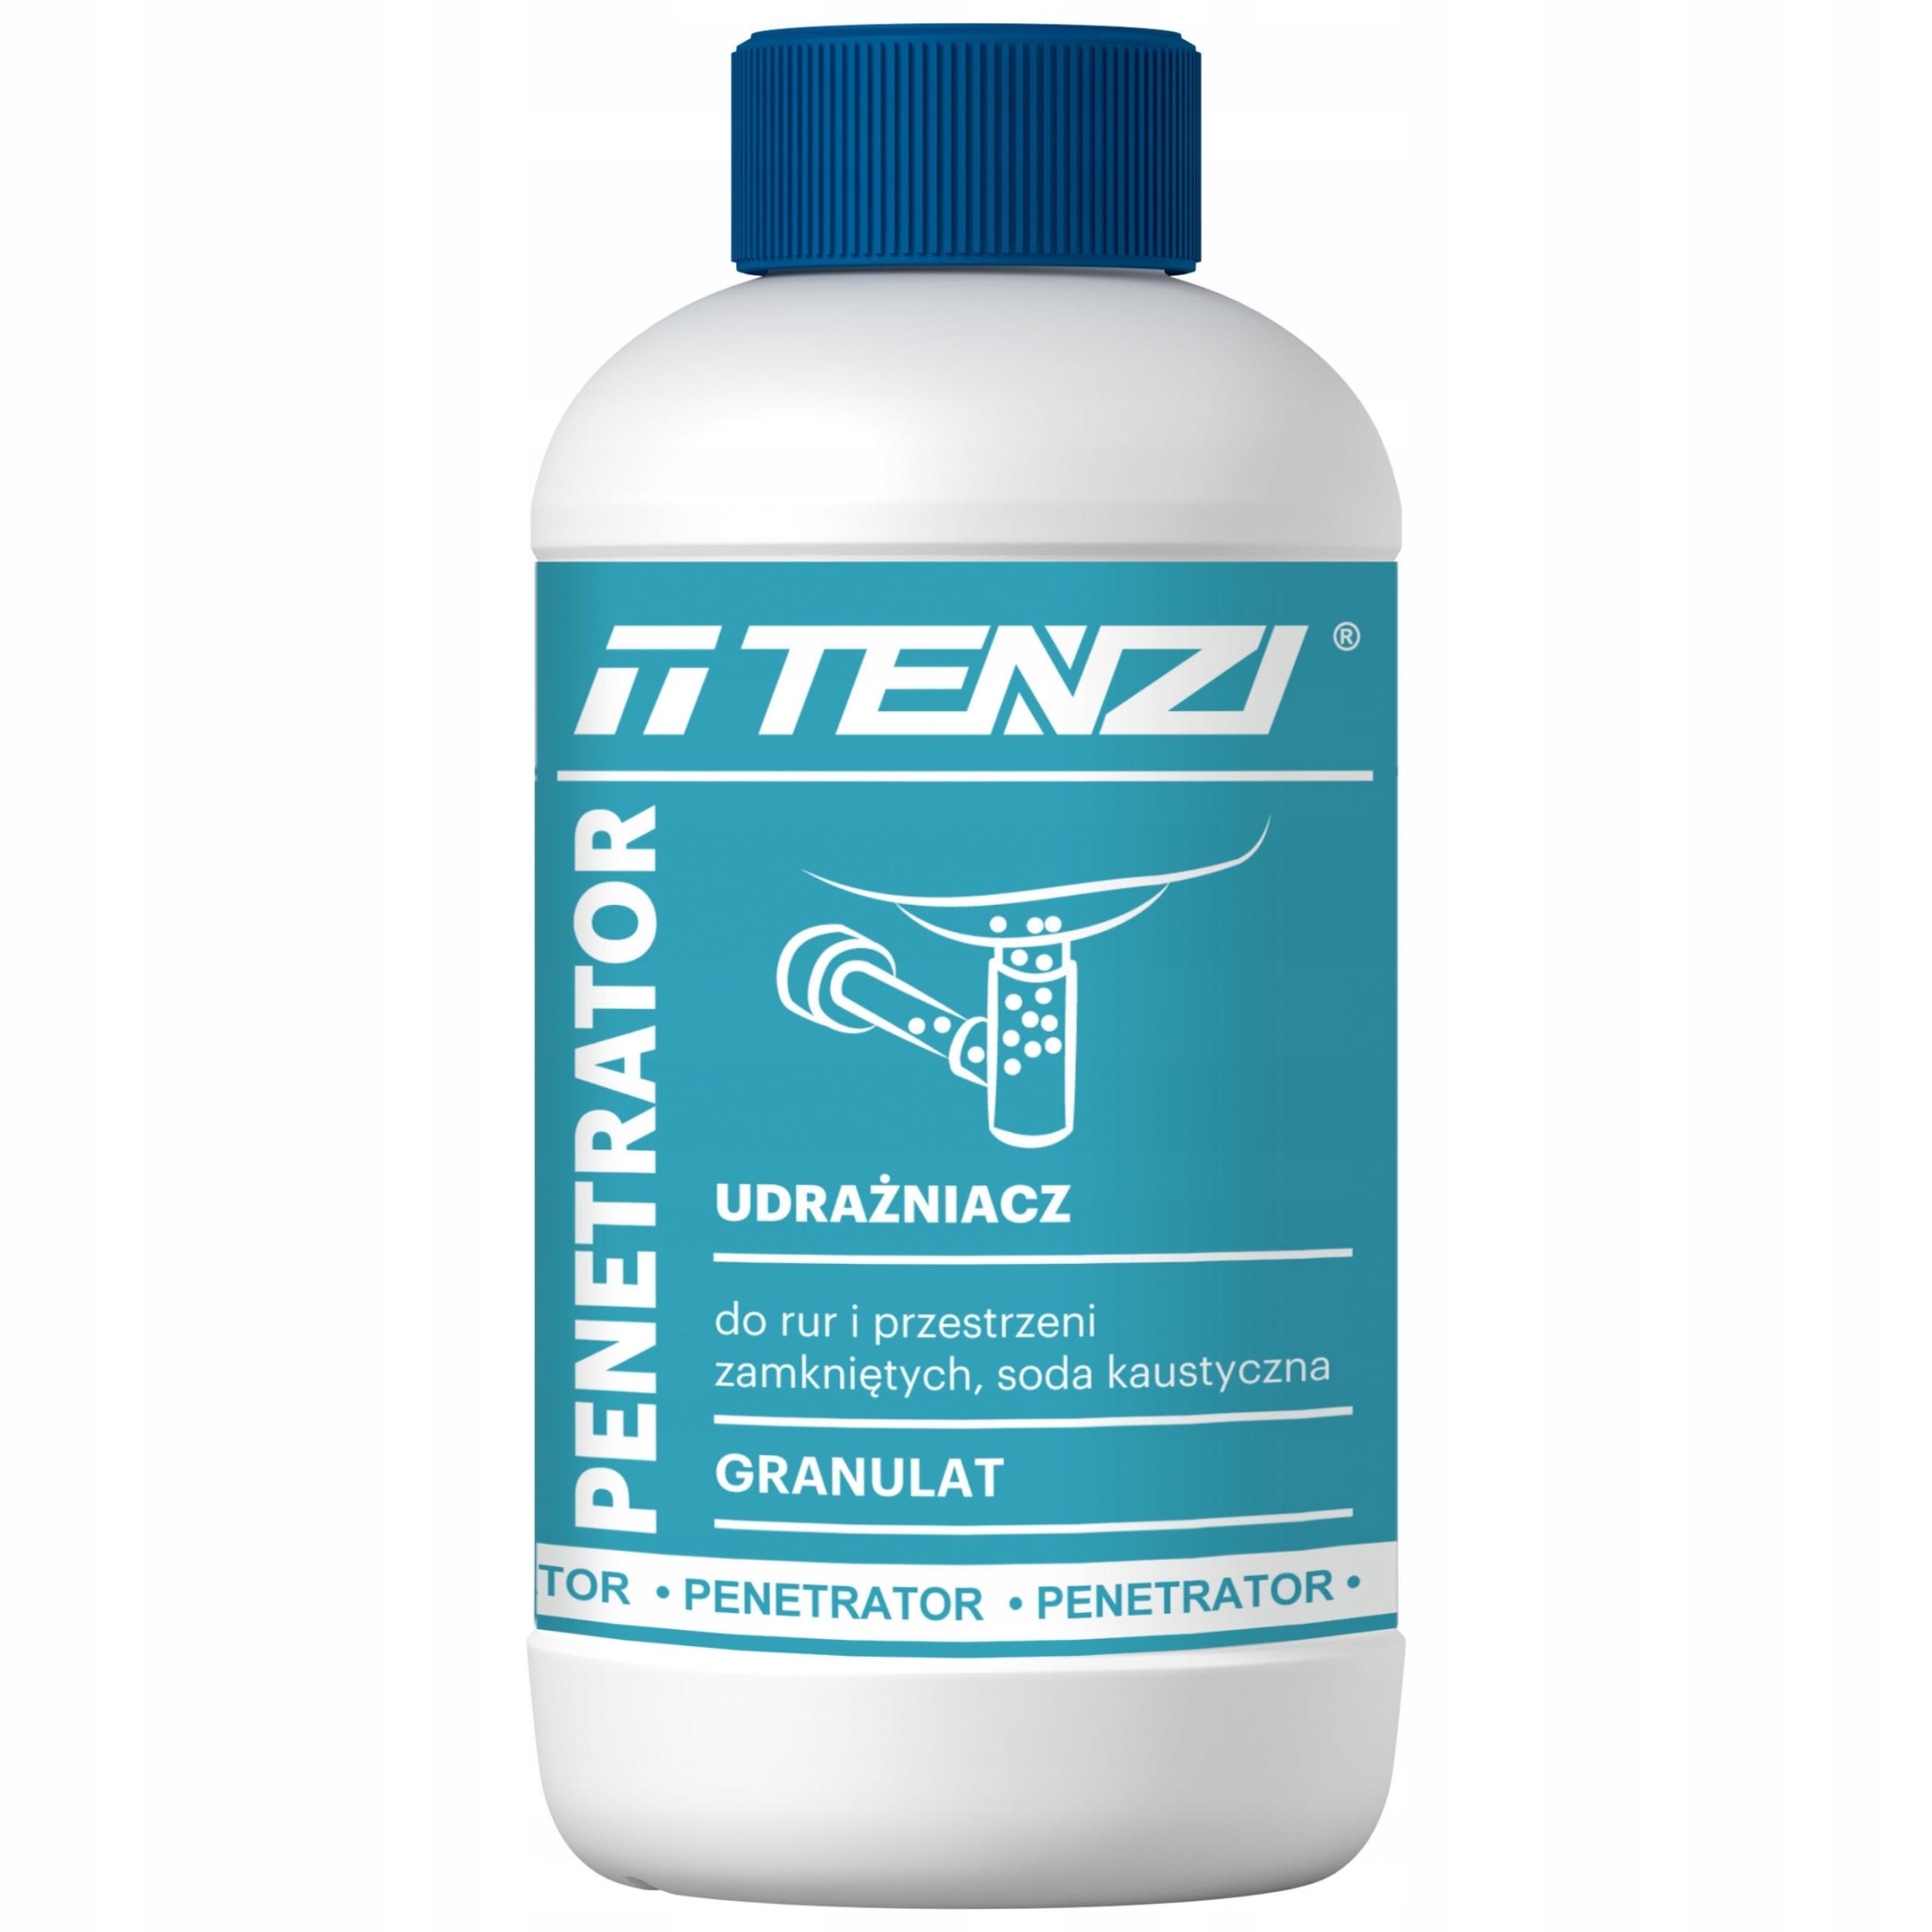 Udrażniacz для труб и отводов Tenzi Penetrator 500g